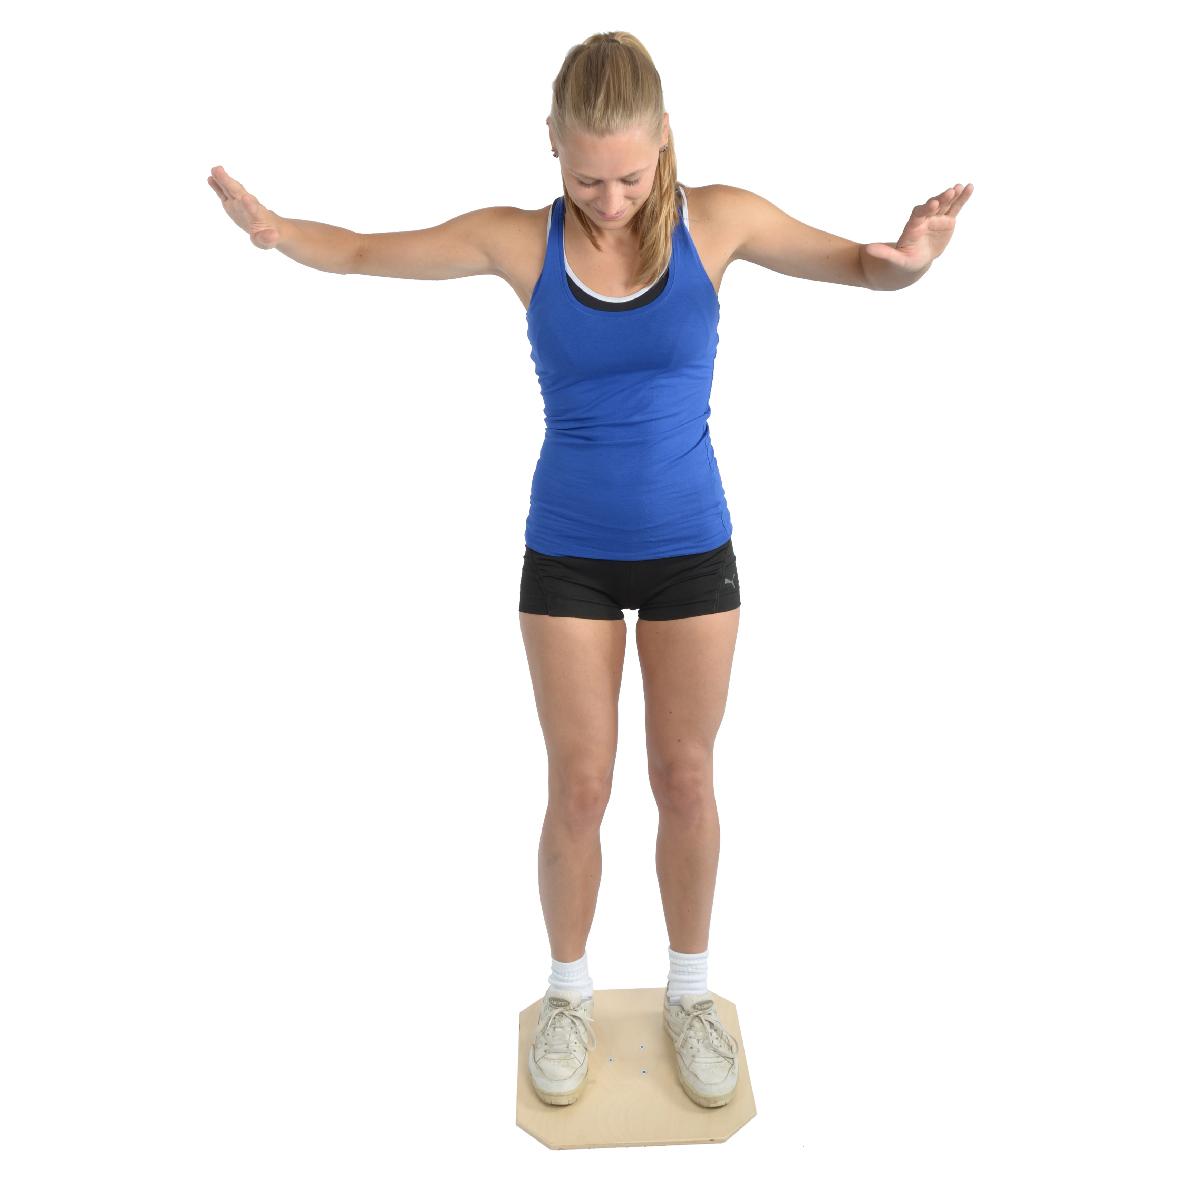 05-040001 – Mambo Max Wooden Balance Board – Rehab 2-01